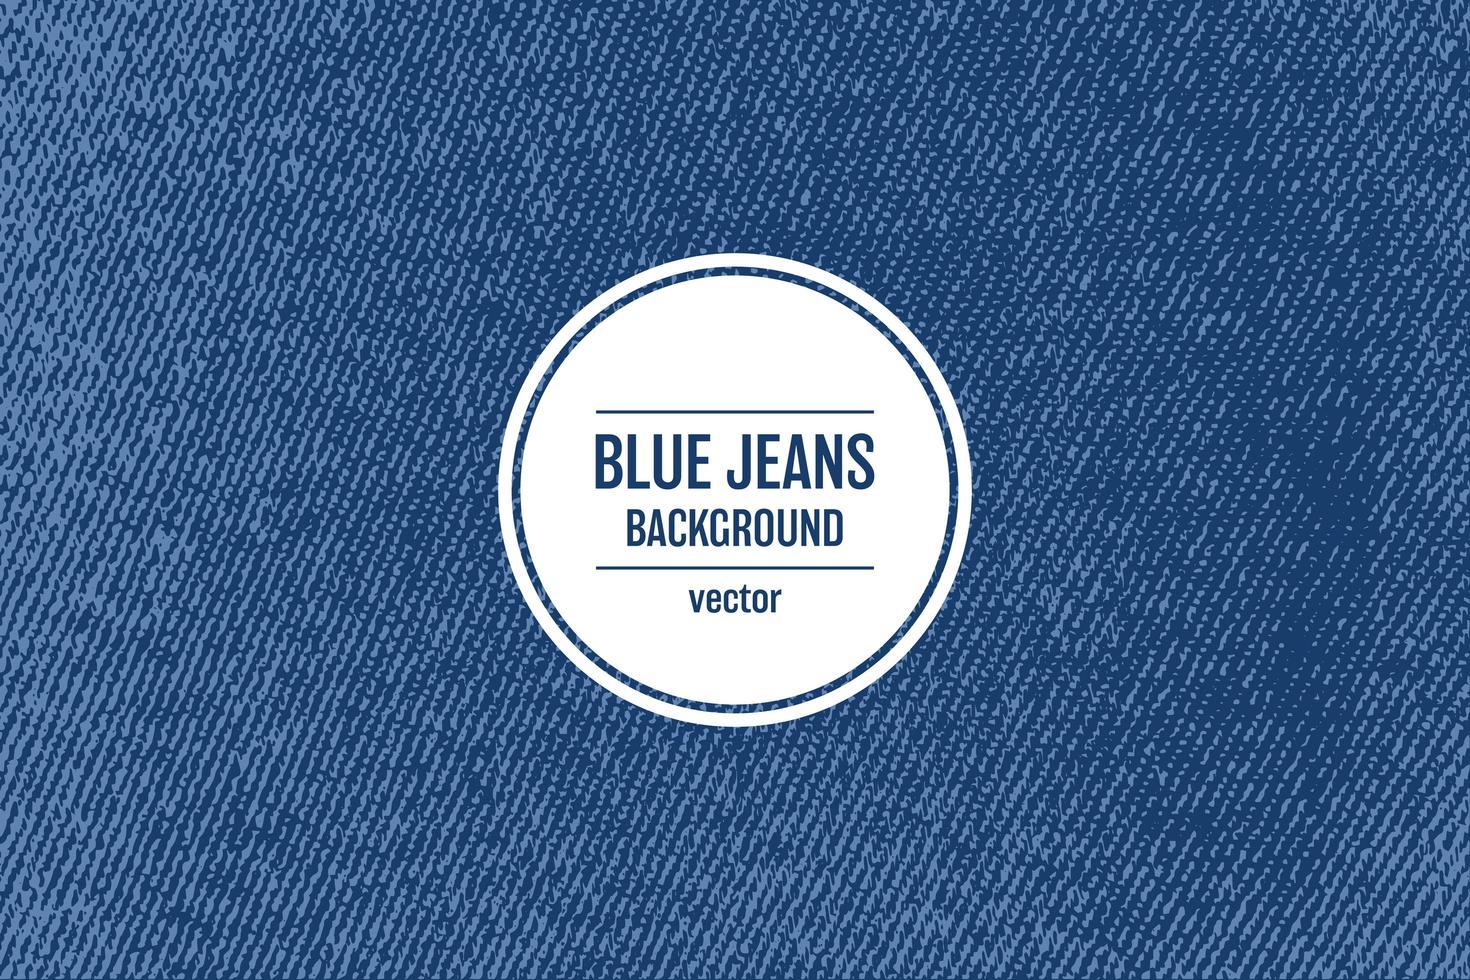 jeans textur bakgrund vektor design illustration